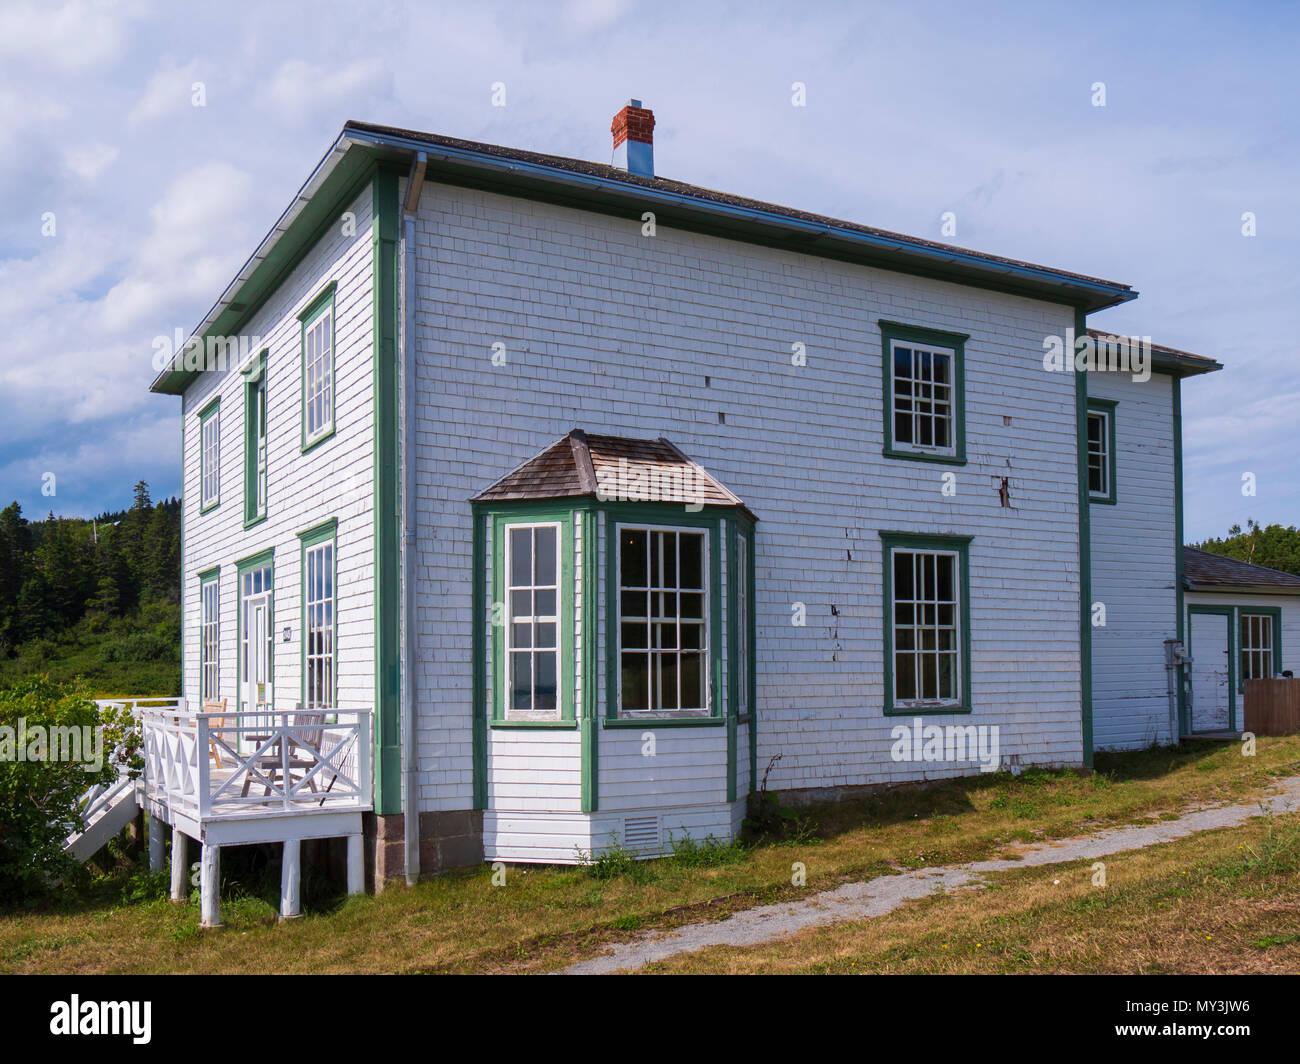 Historic foursquare House, Forillon National Park, Gaspe Peninsula, Canada. - Stock Image